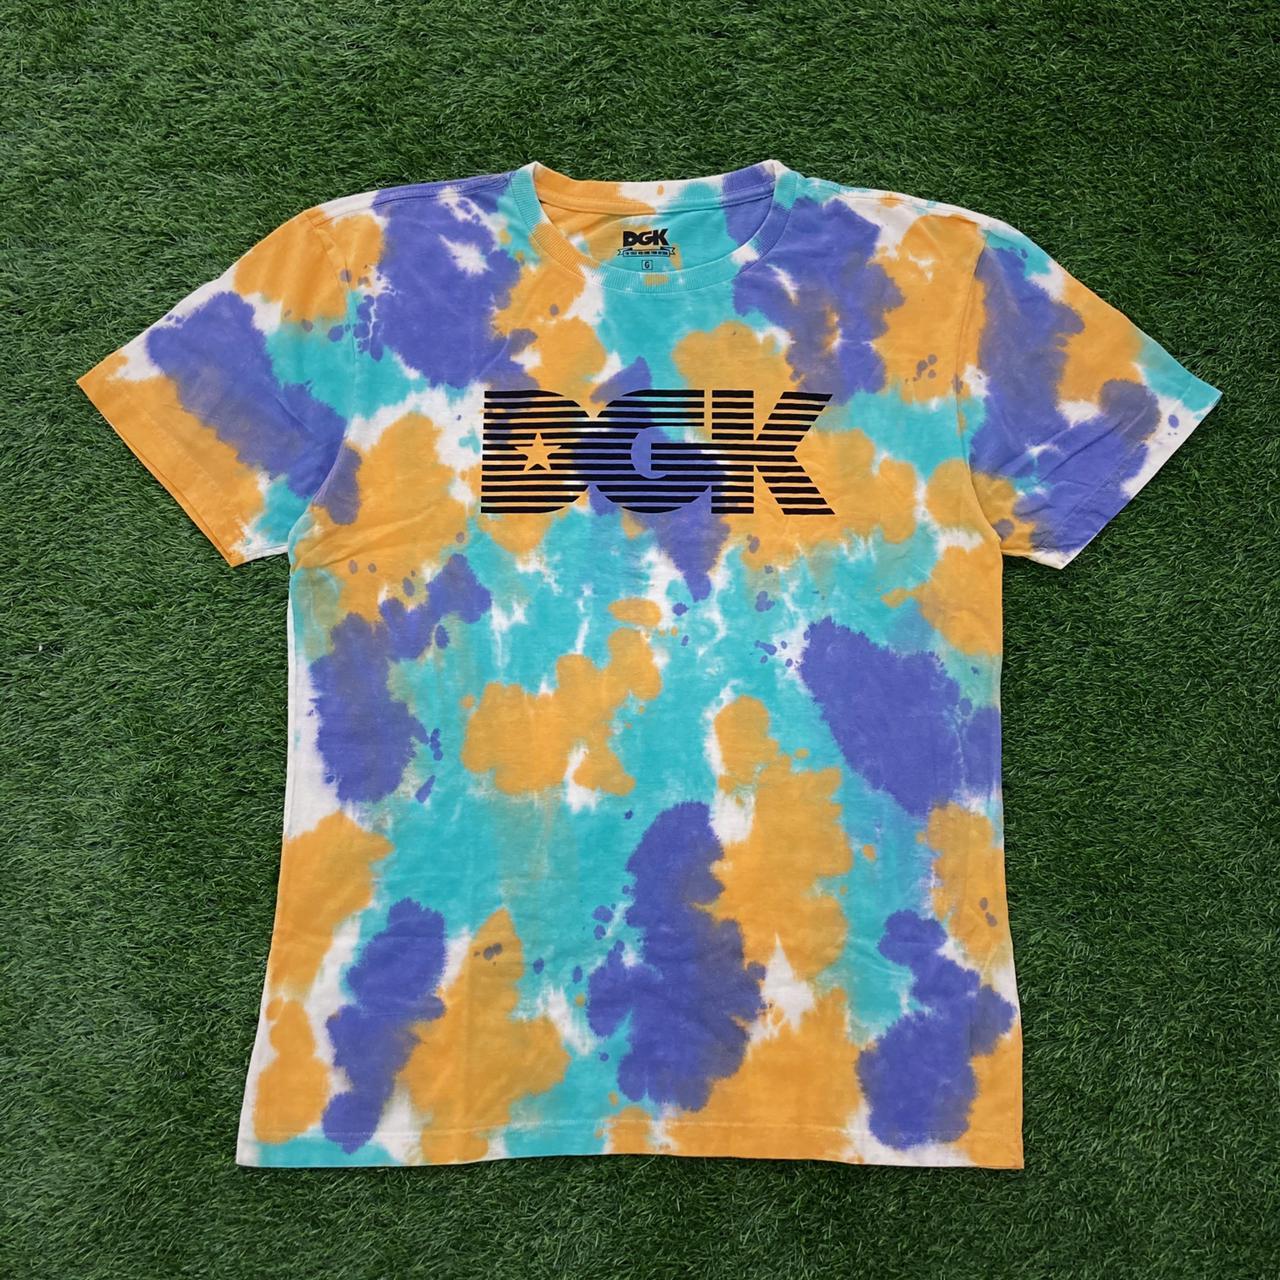 Camiseta dgk levels tie dye